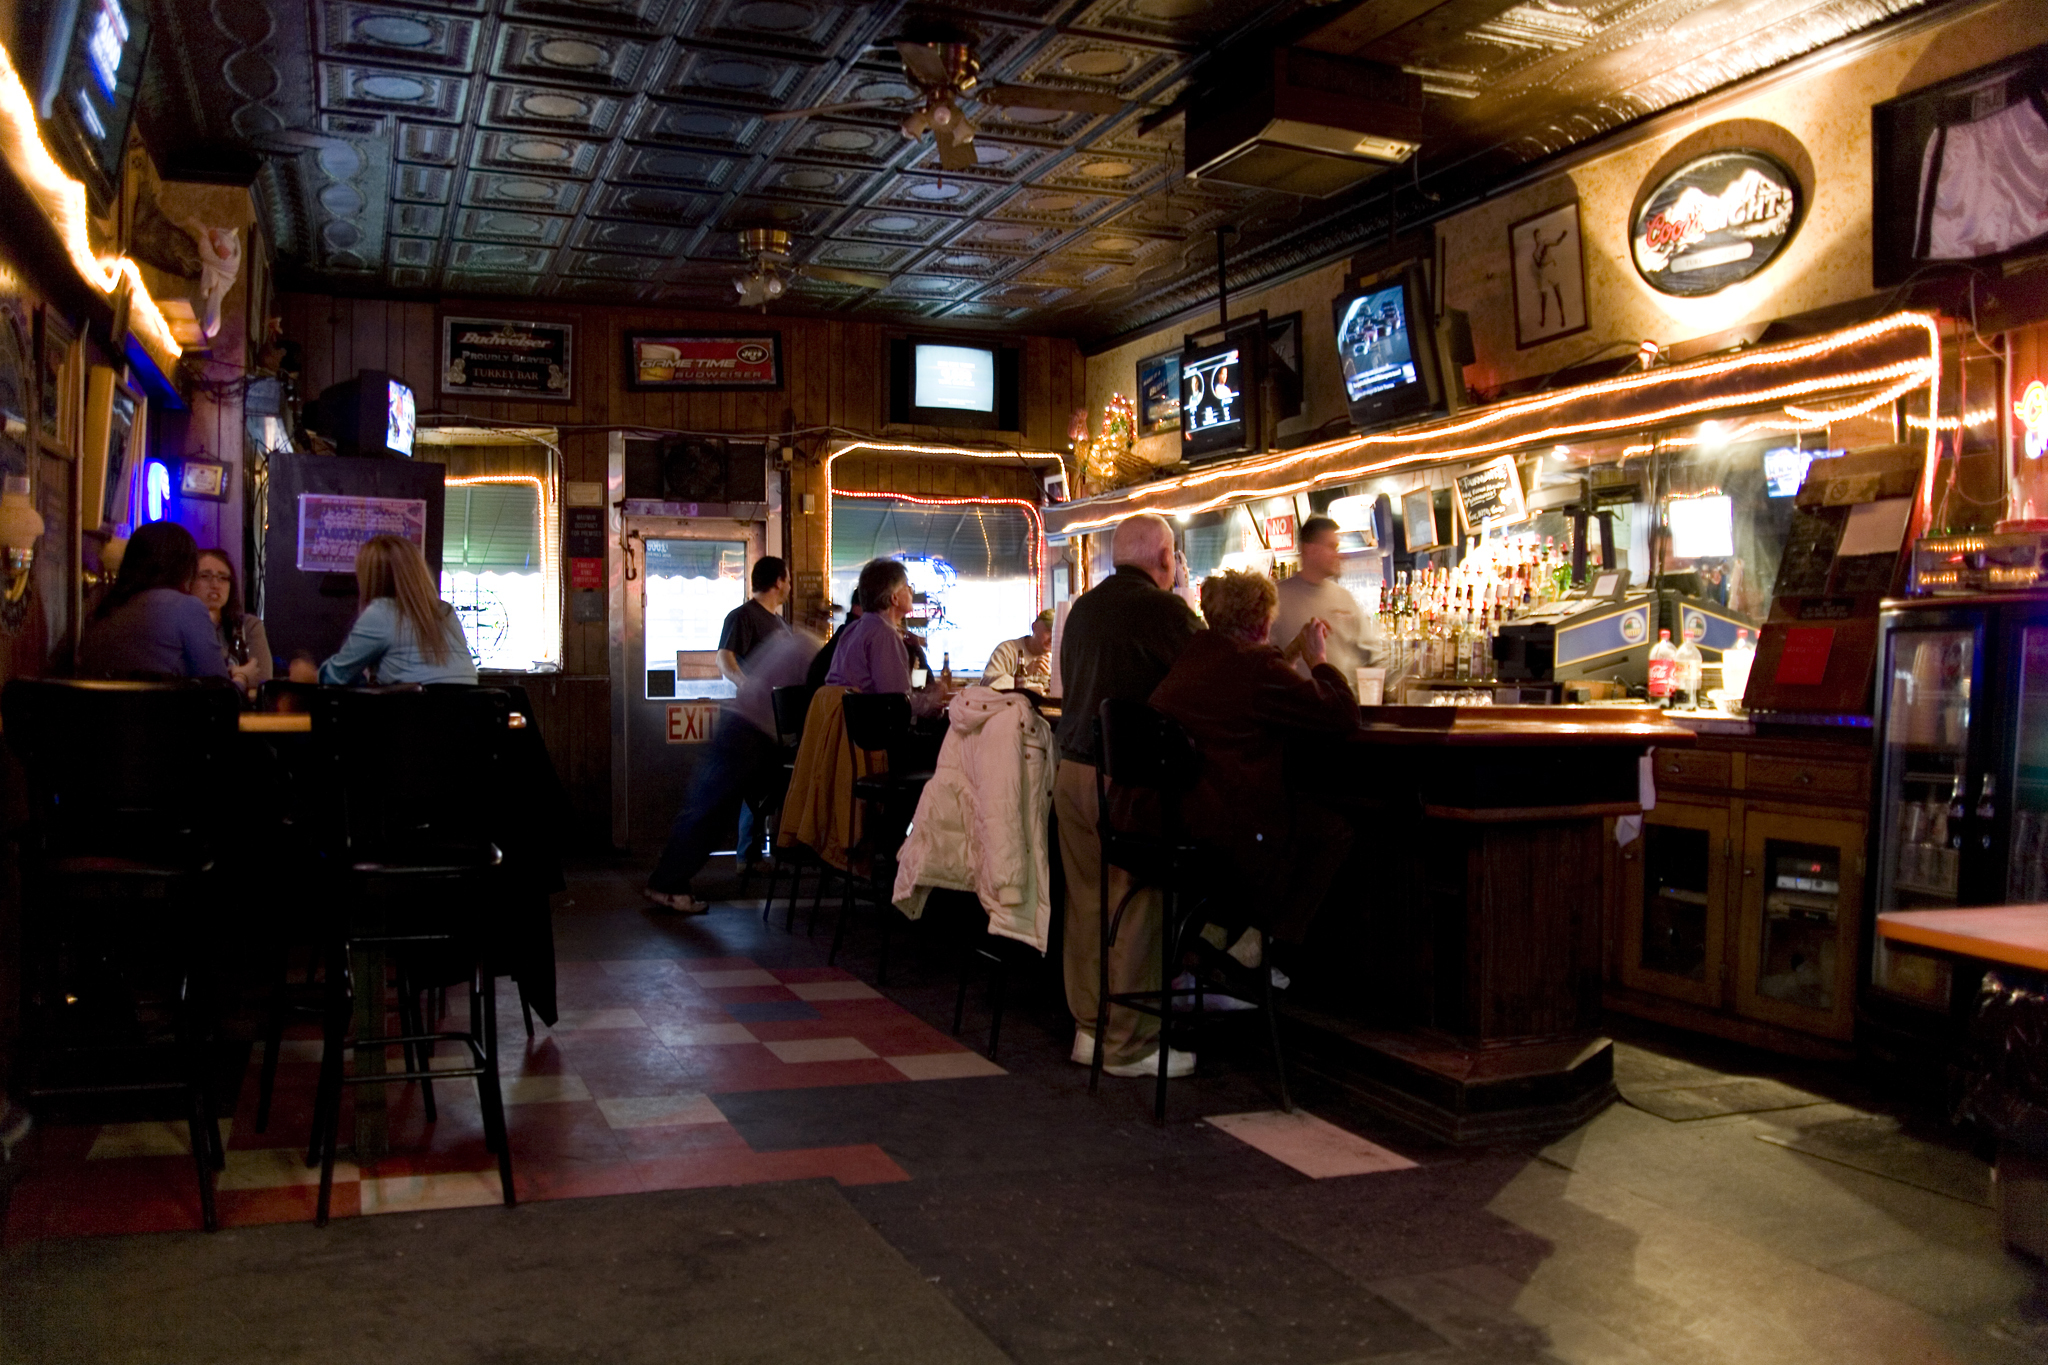 Turkey's Nest Tavern